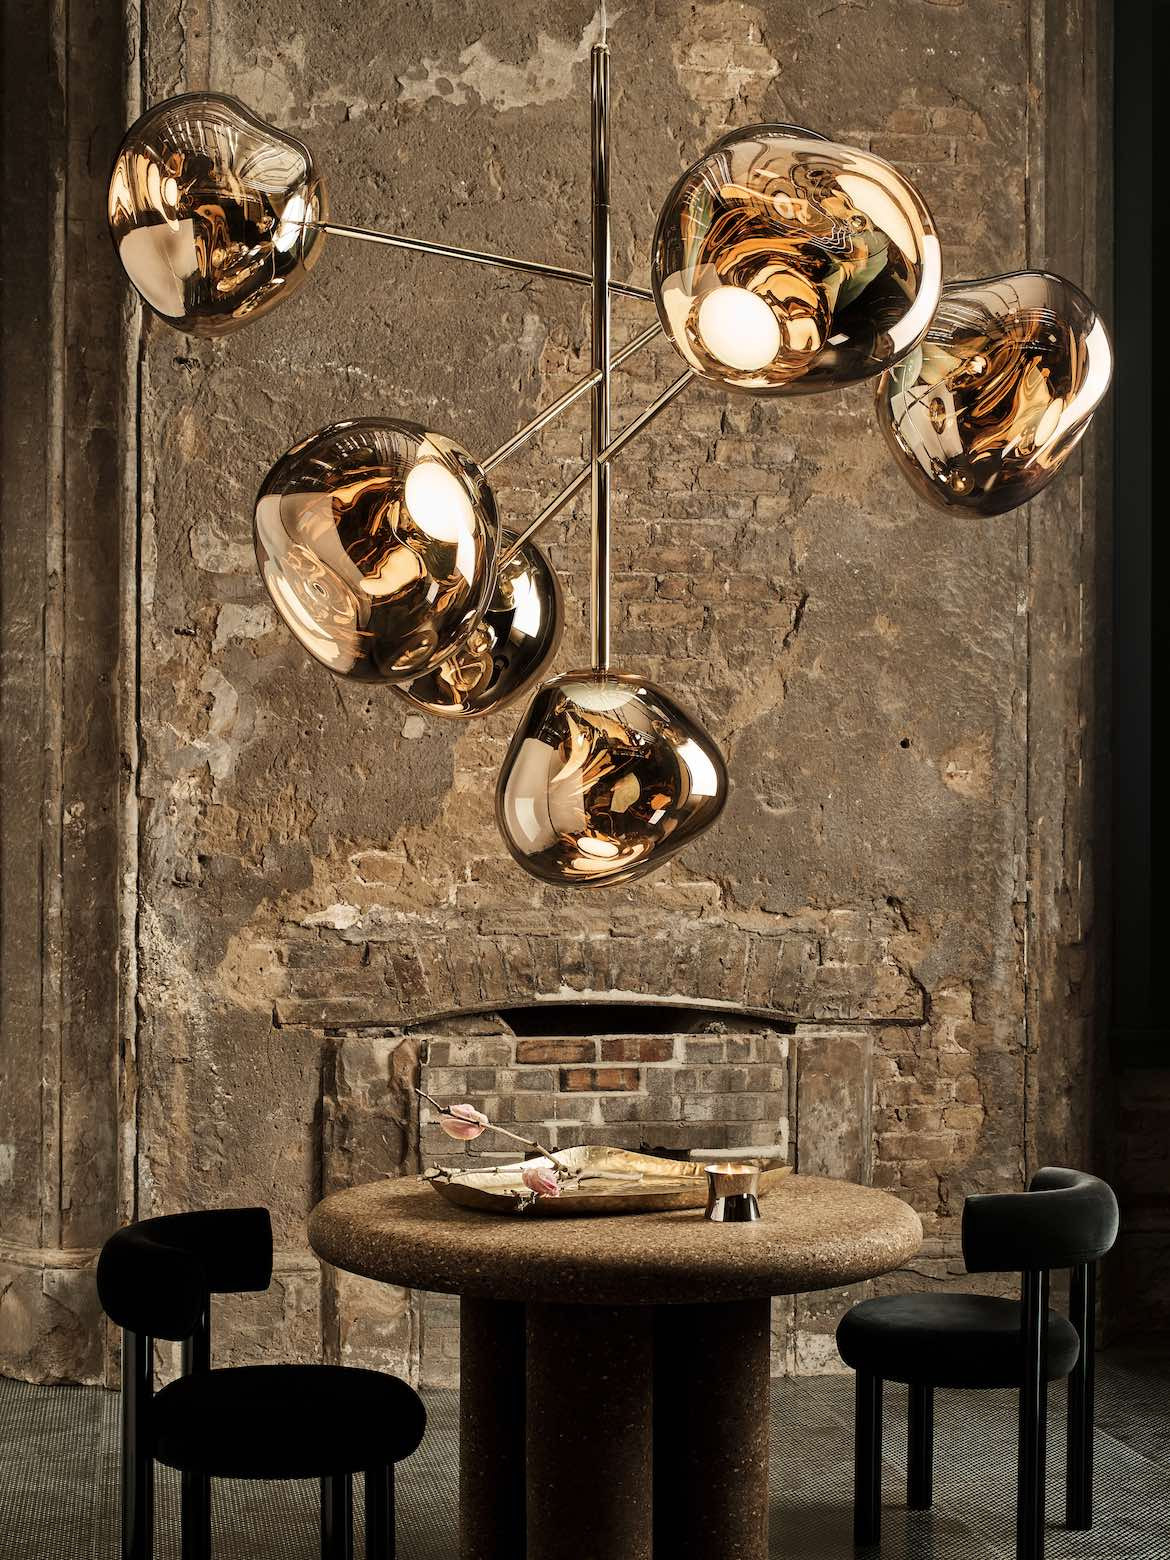 Tom Dixon and Prolicht gold light at Milan Design Week.